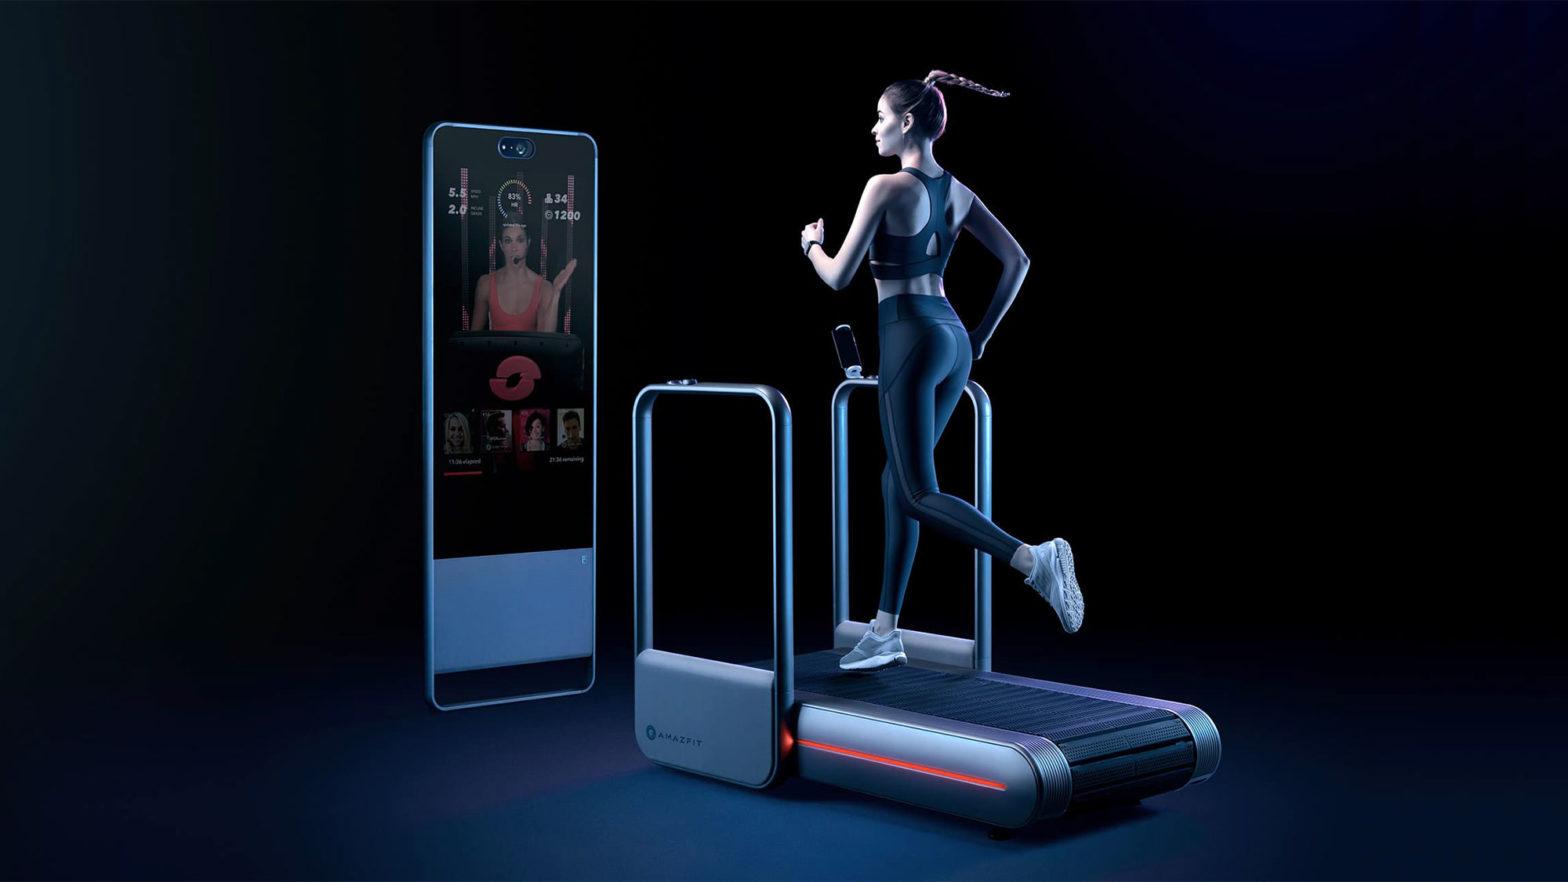 Amazfit Treadmills & TWS Earphones